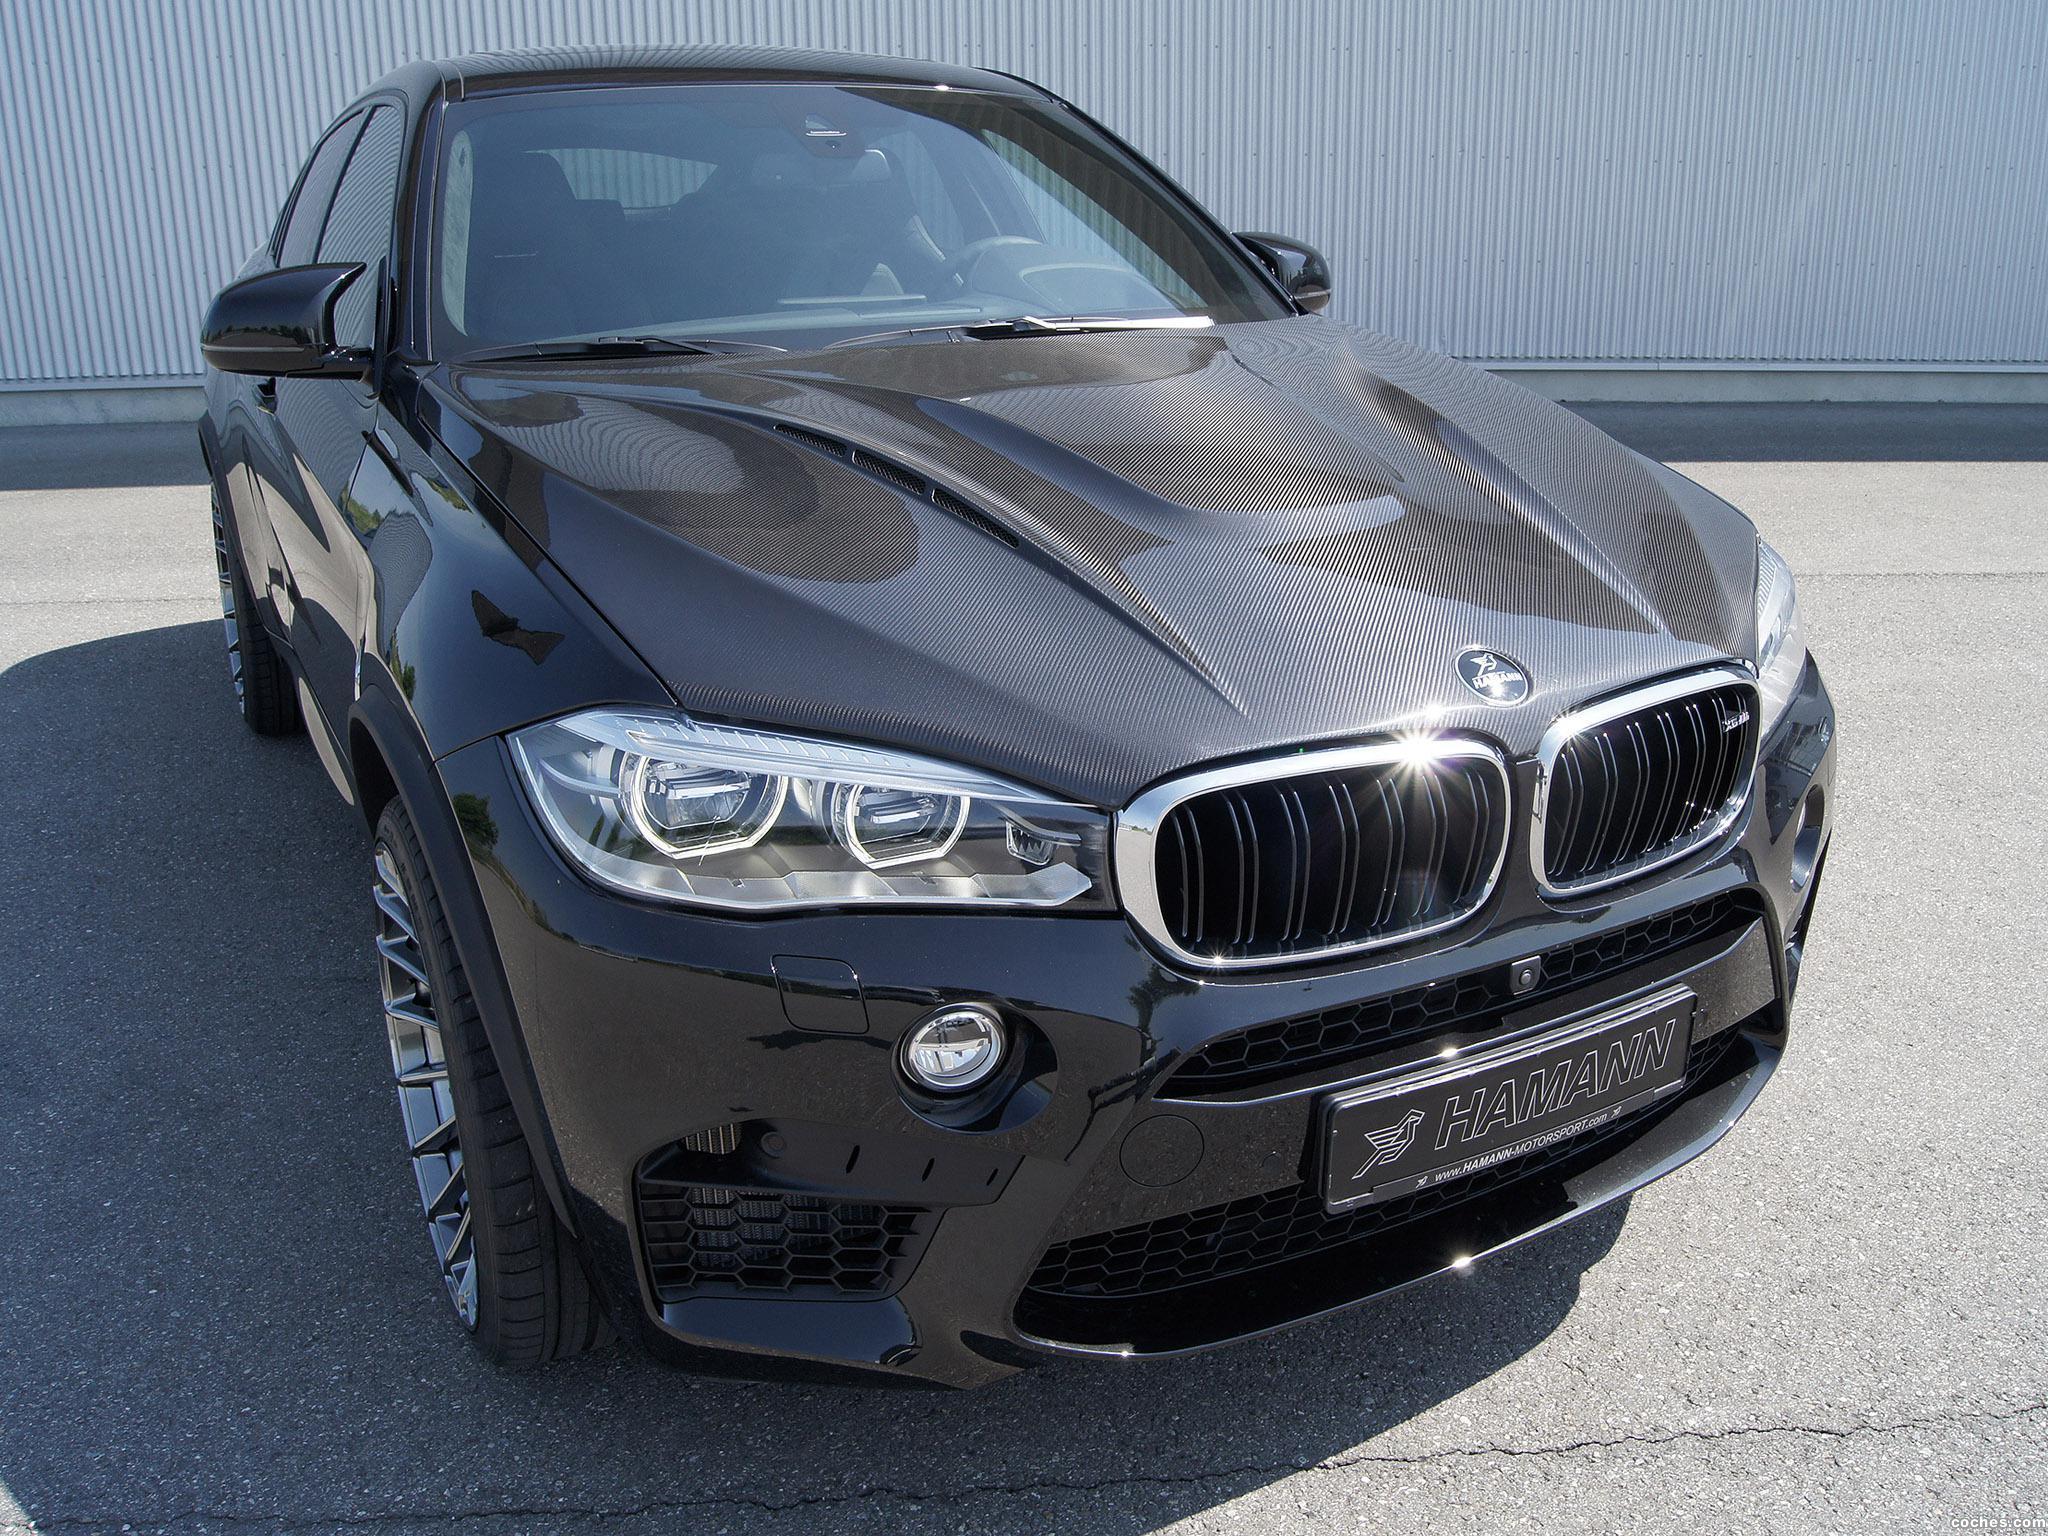 Foto 0 de Hamann BMW X6 M F16 2015